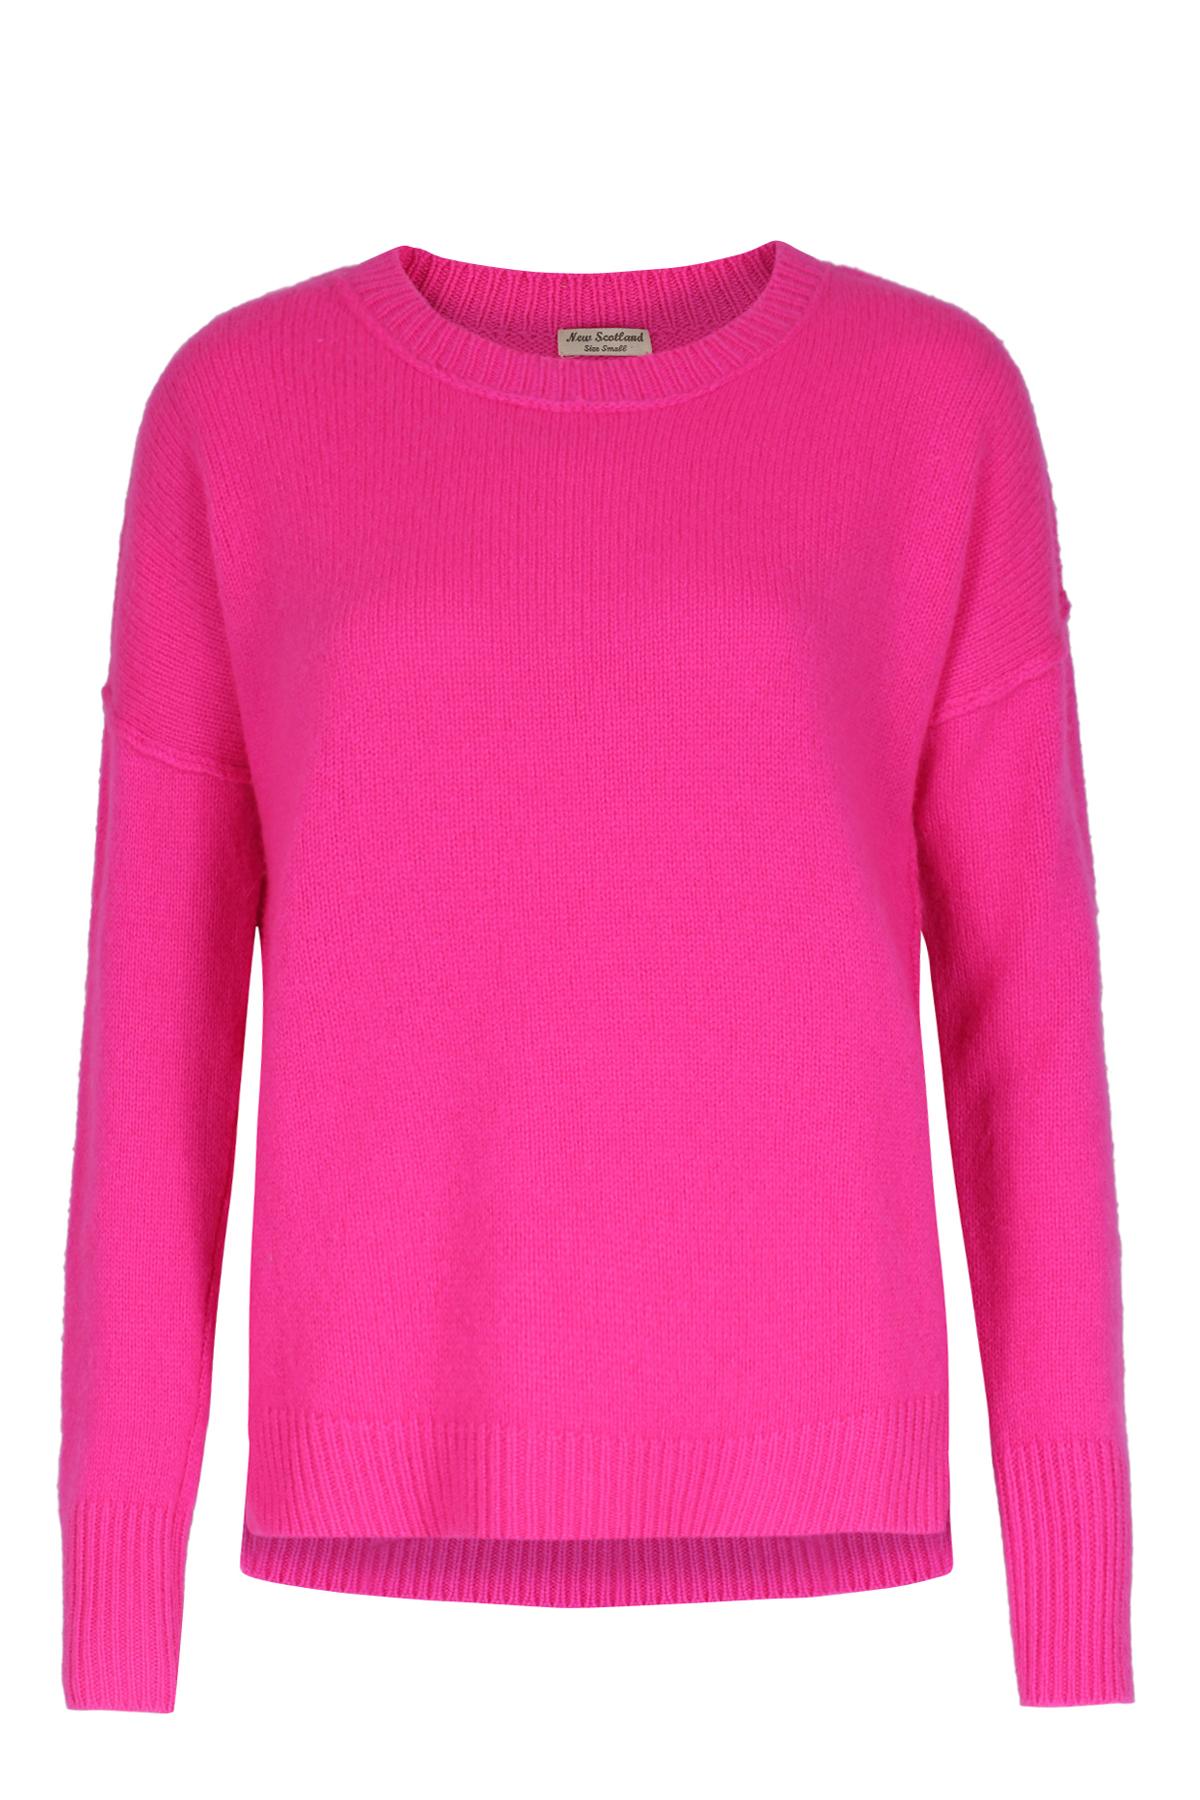 pullover brushed cashmere pink von new scotland bei cashmere. Black Bedroom Furniture Sets. Home Design Ideas